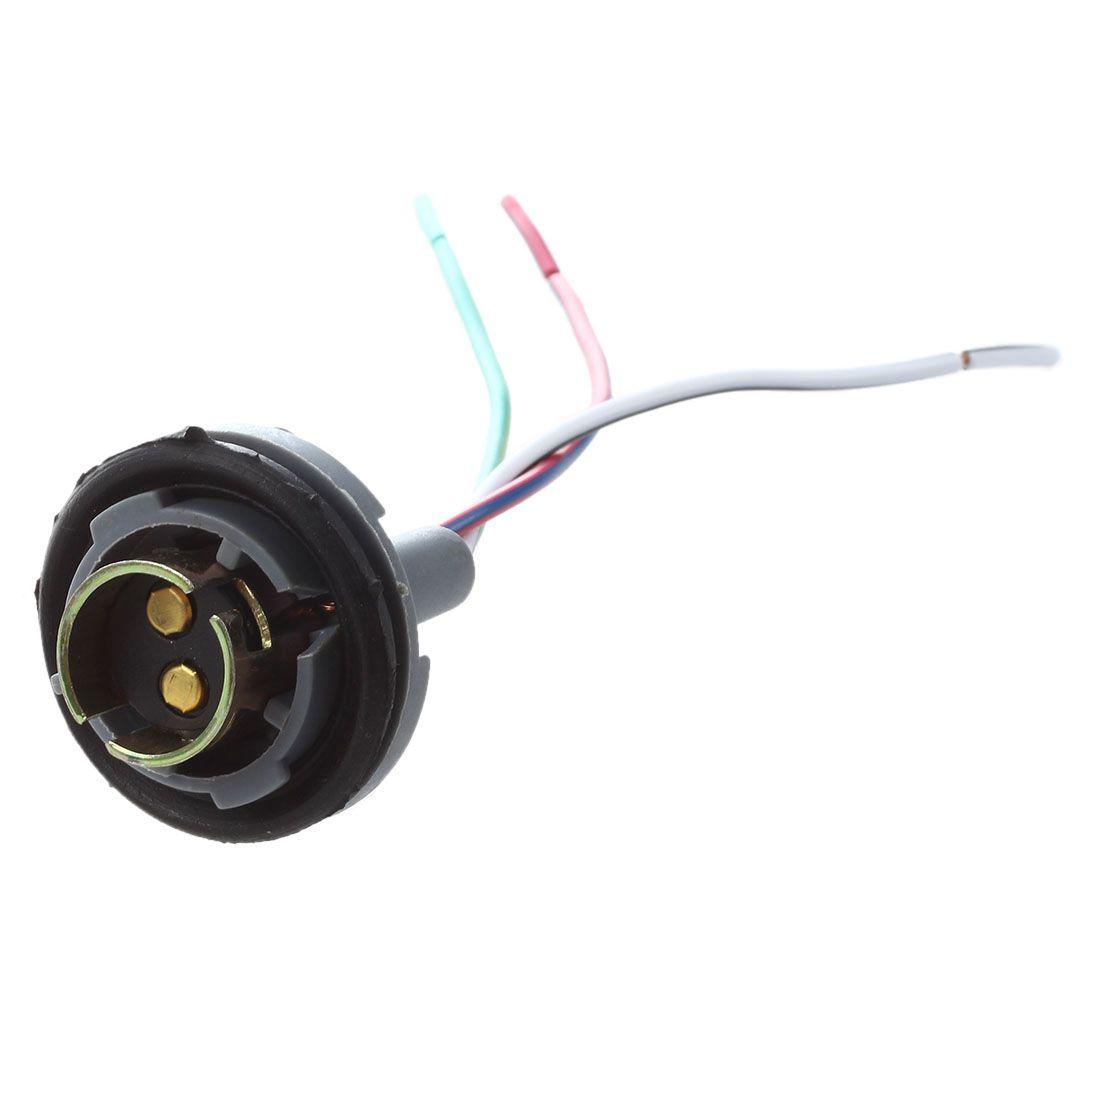 hight resolution of 1157 signal brake light bulb socket connector wire harness plug 2 pcs